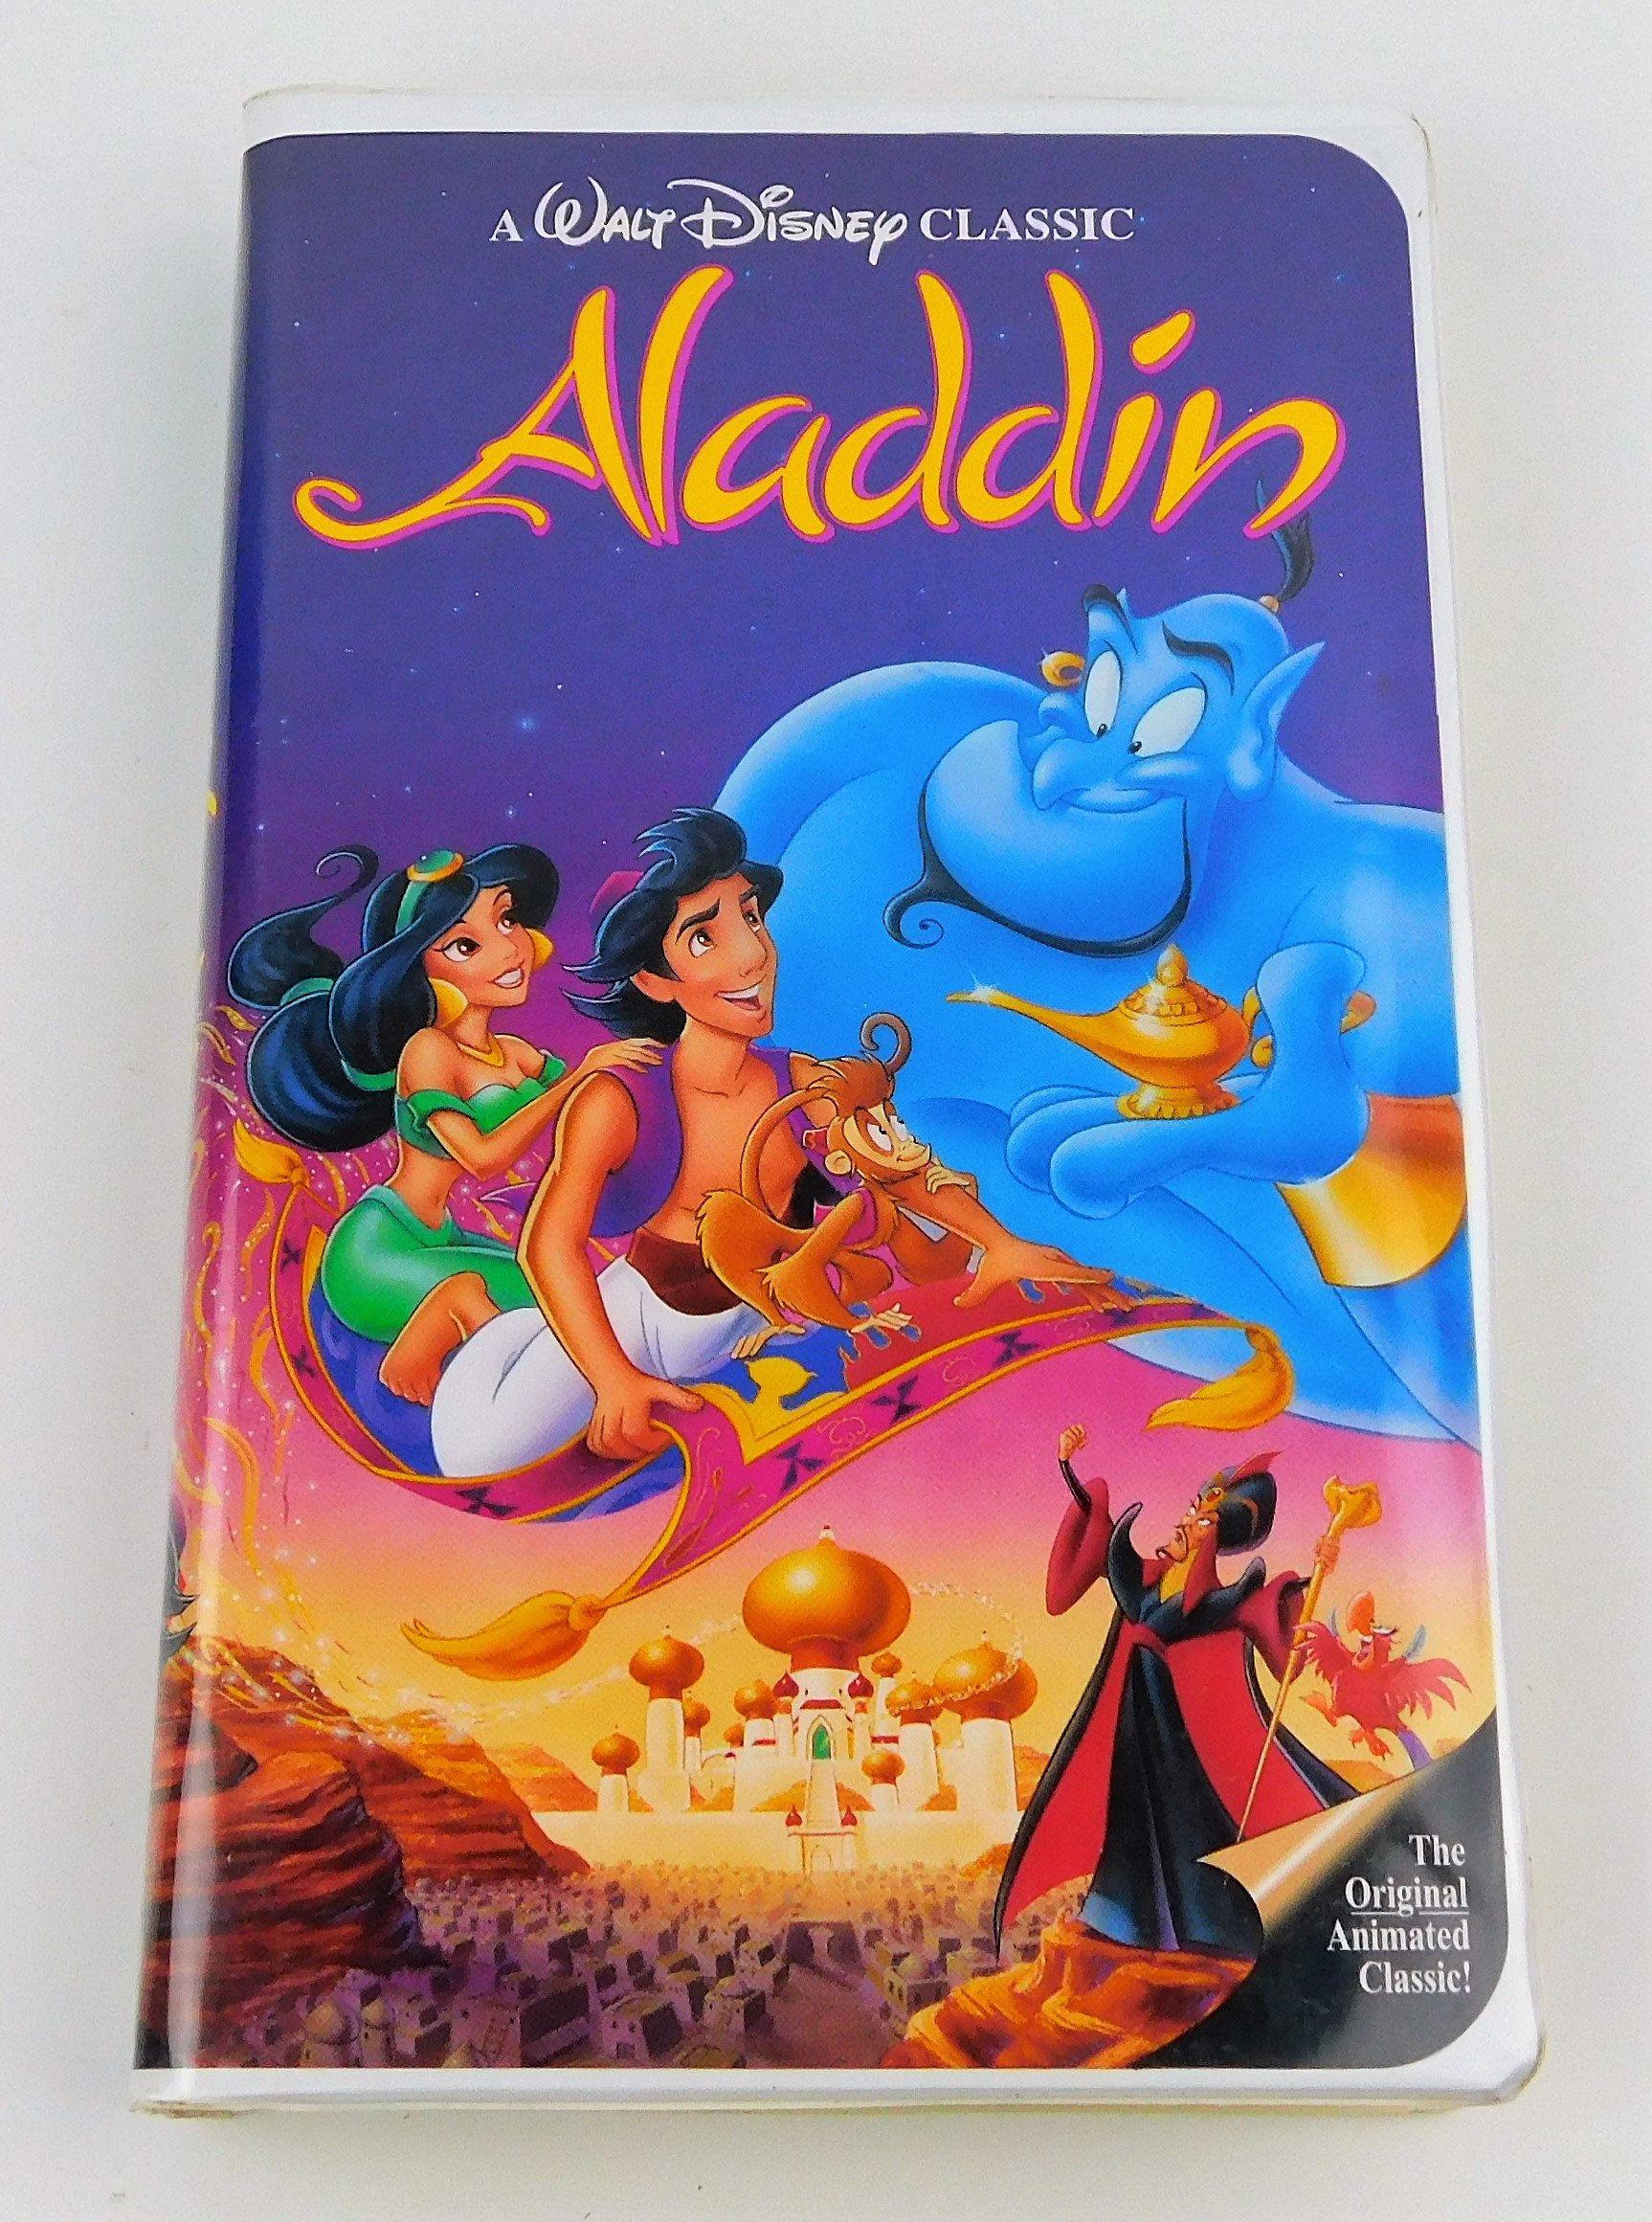 Aladdin Vhs 1993 Black Diamond Edition Etsy Autograph Book Disney Aladdin Disney Aladdin